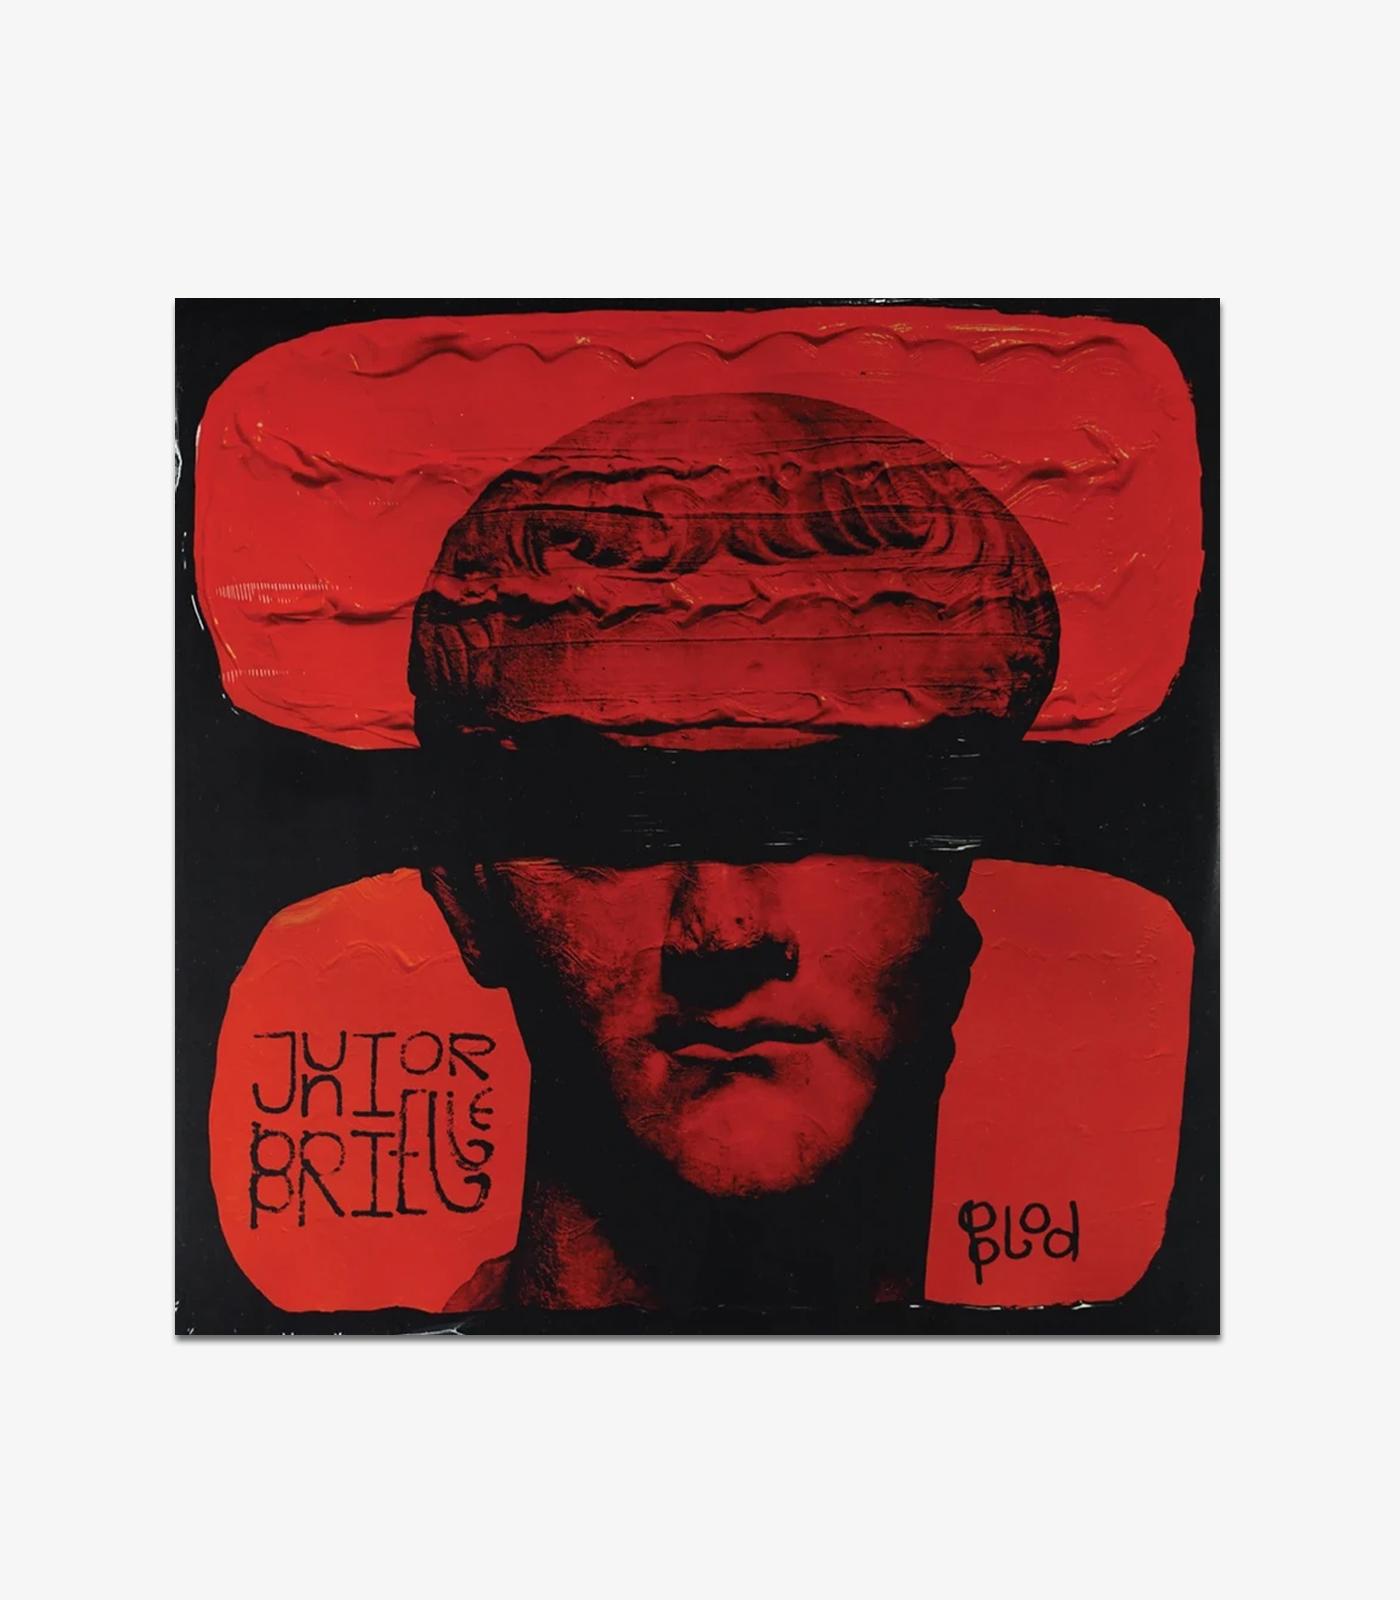 Blod Vinyl